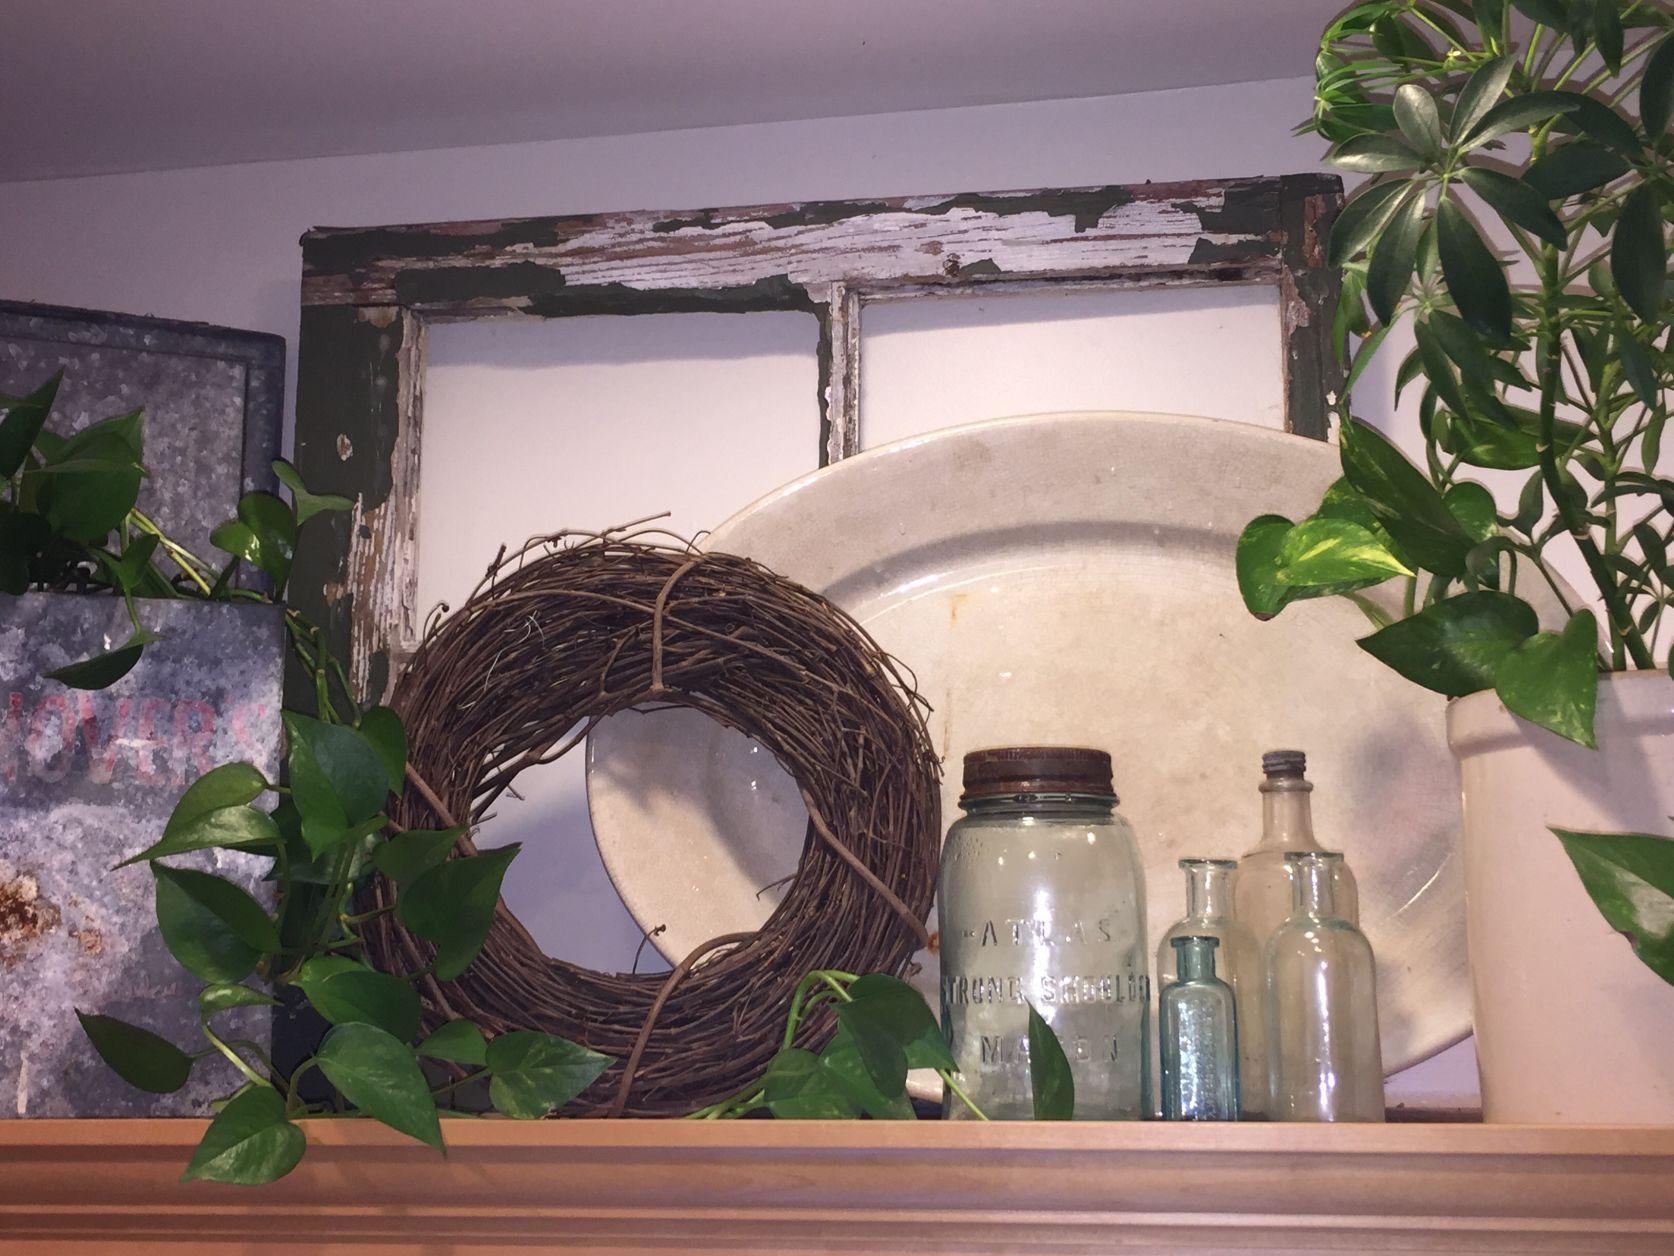 Kitchen Cabinet Decor Above Greenery